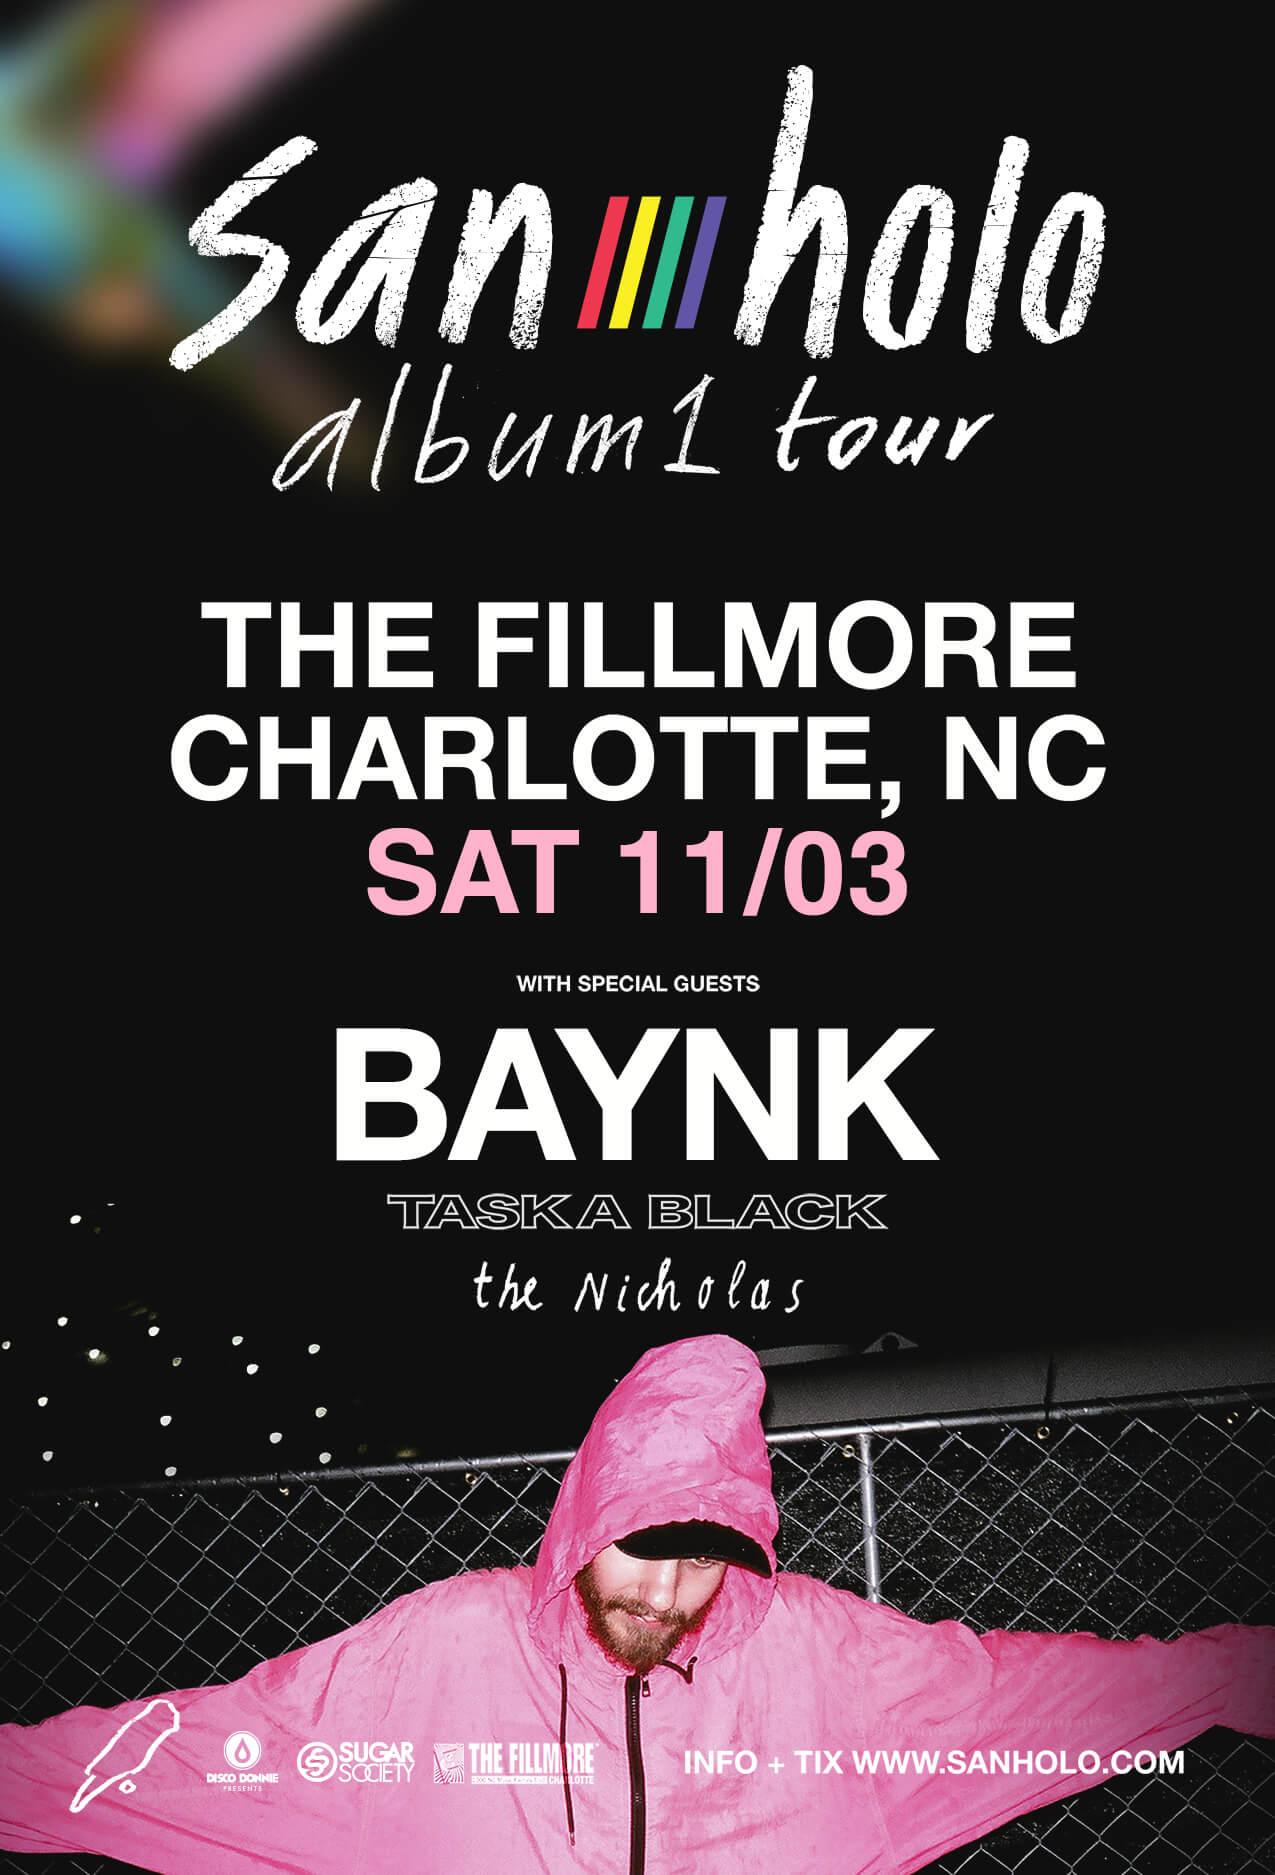 San Holo, Baynk, Taska Black, The Nicholas in Charlotte